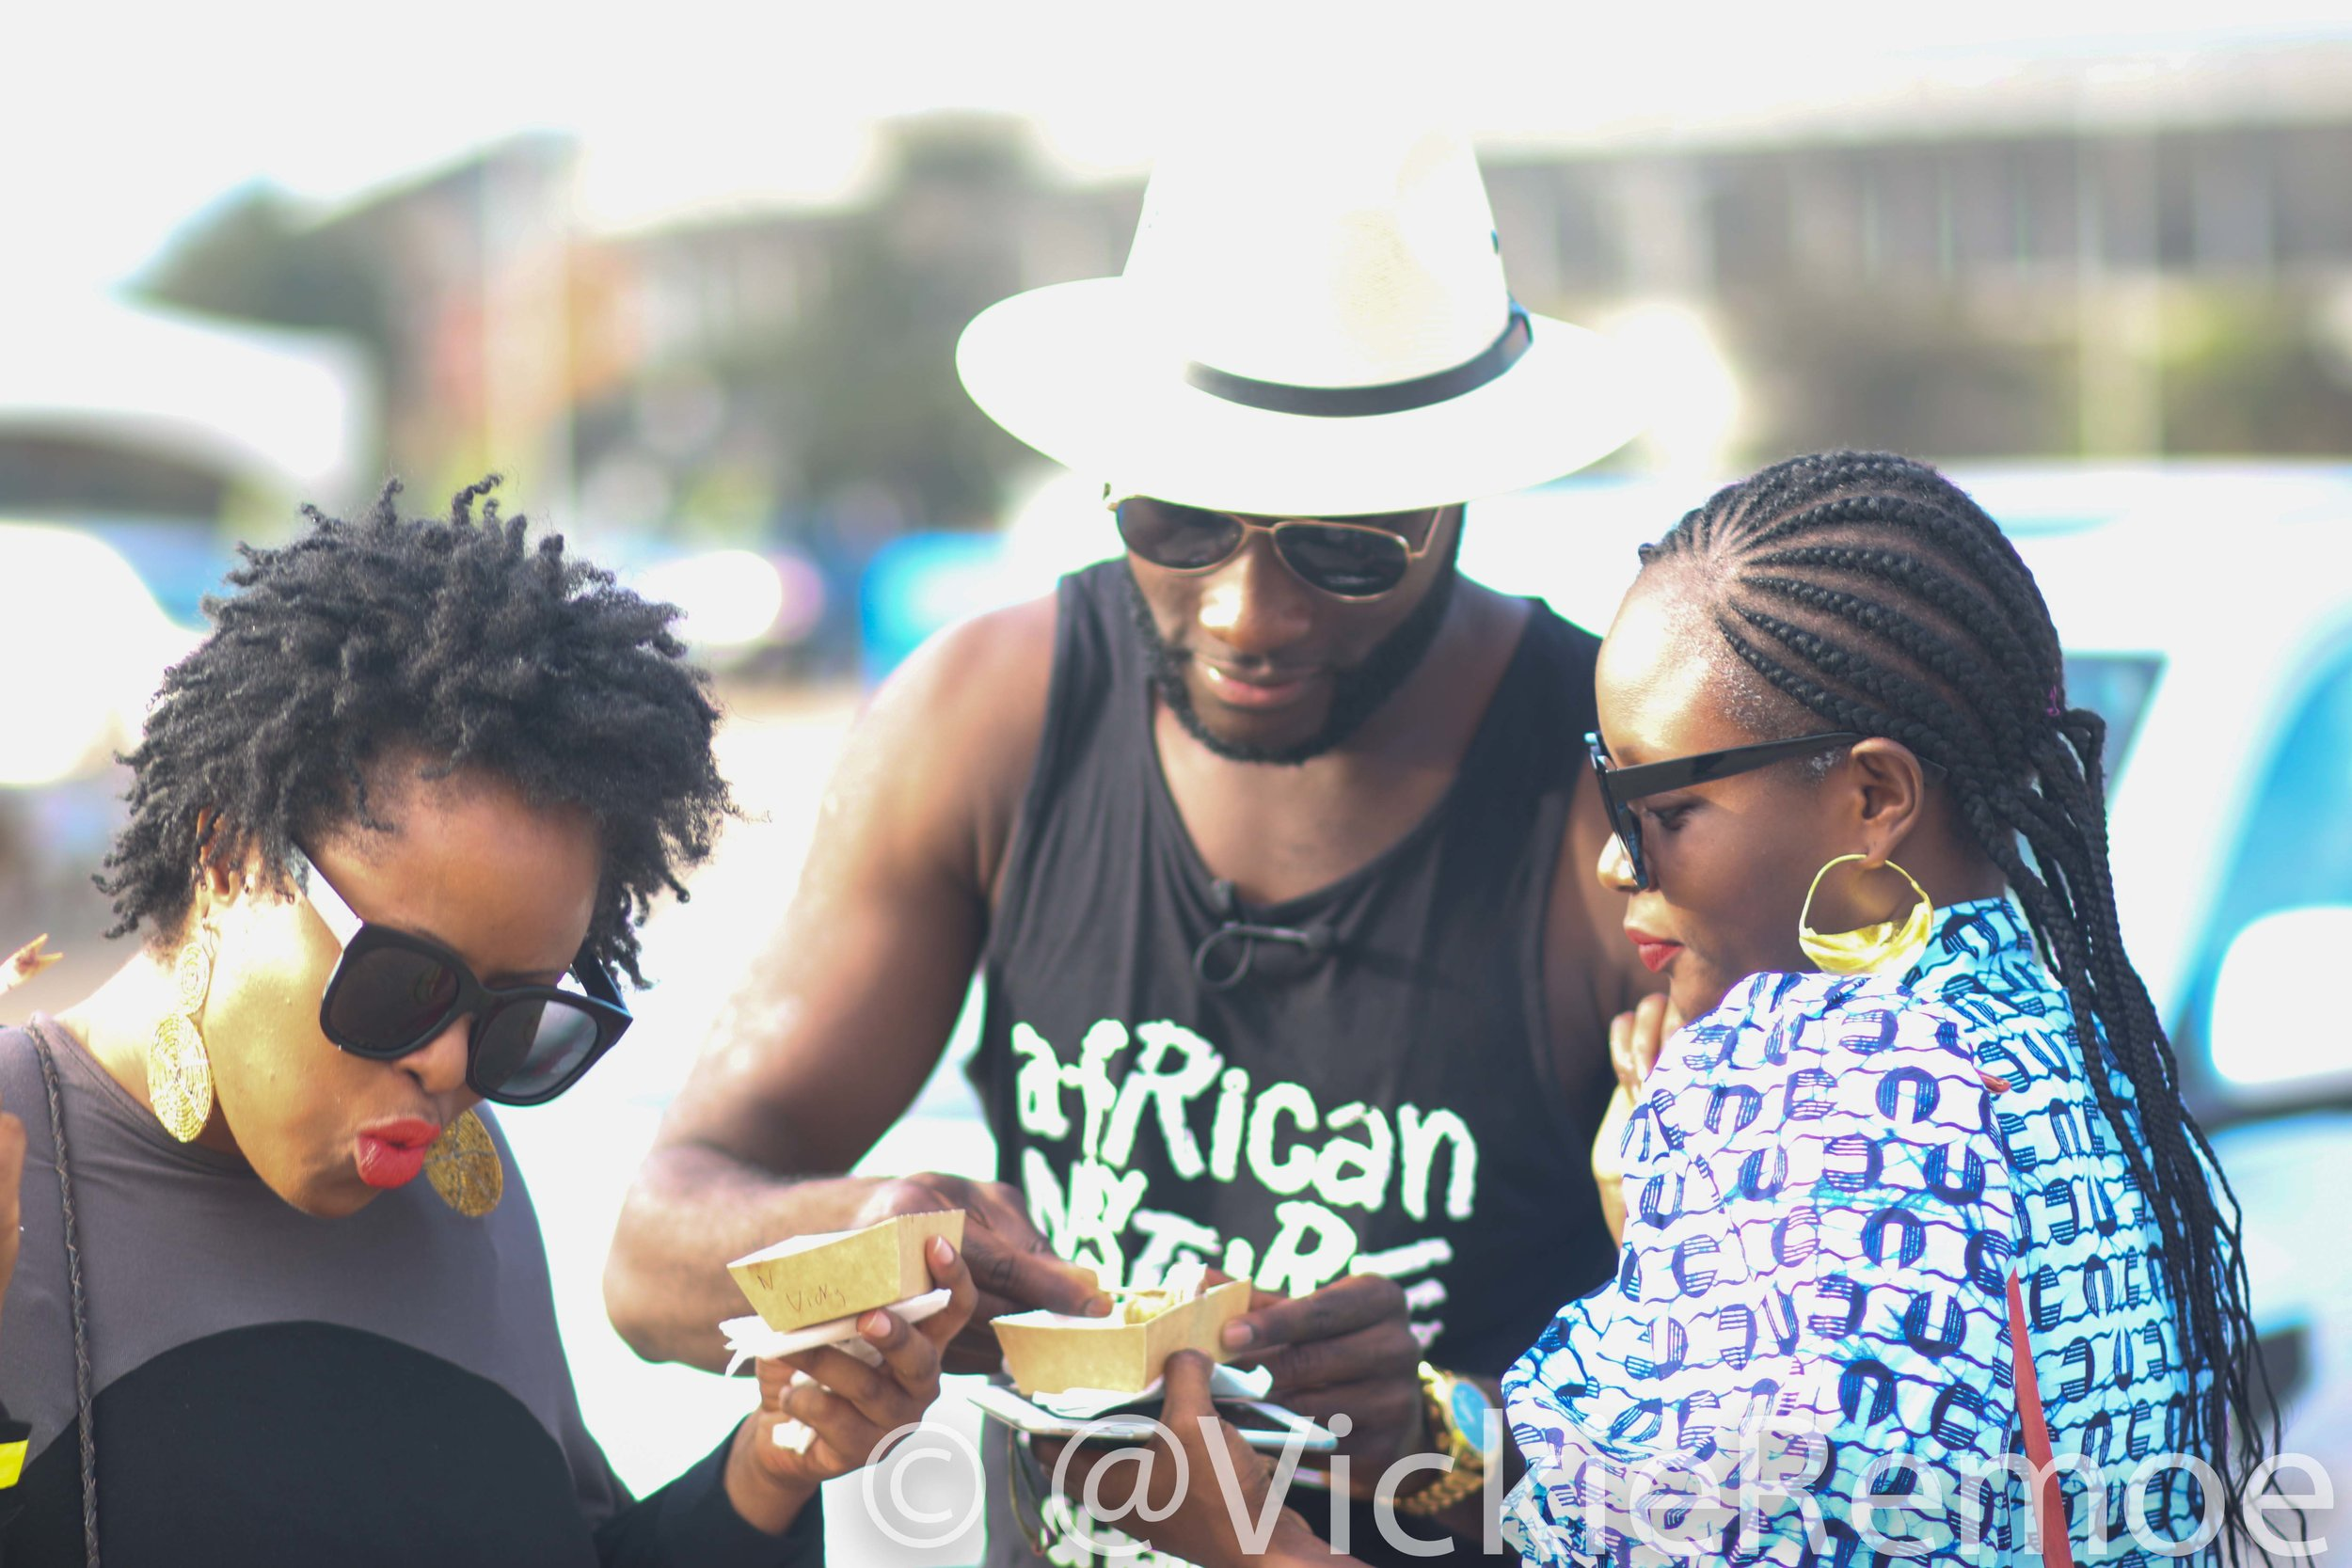 AccraFoodFestival-VickieRemoeBlog-Ghana7.jpg